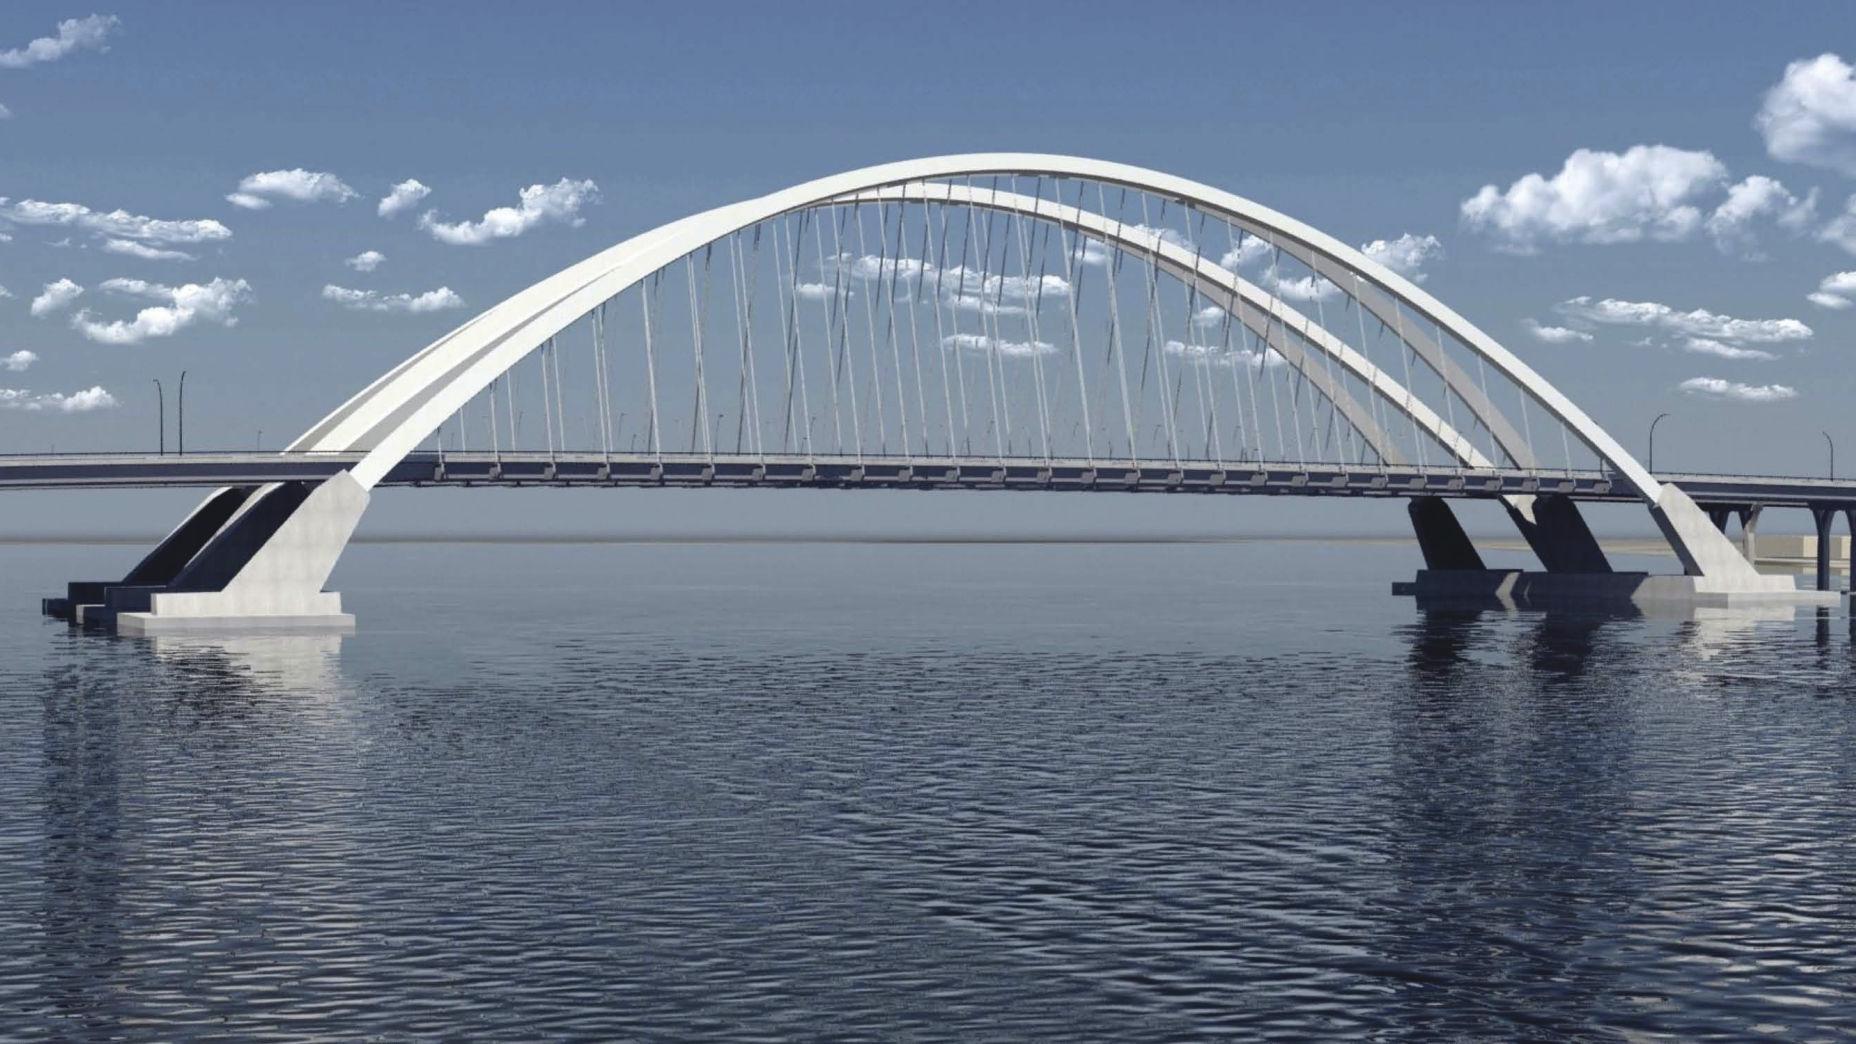 Arch Is Next Step In New I 74 Bridge Local News Qconline Com